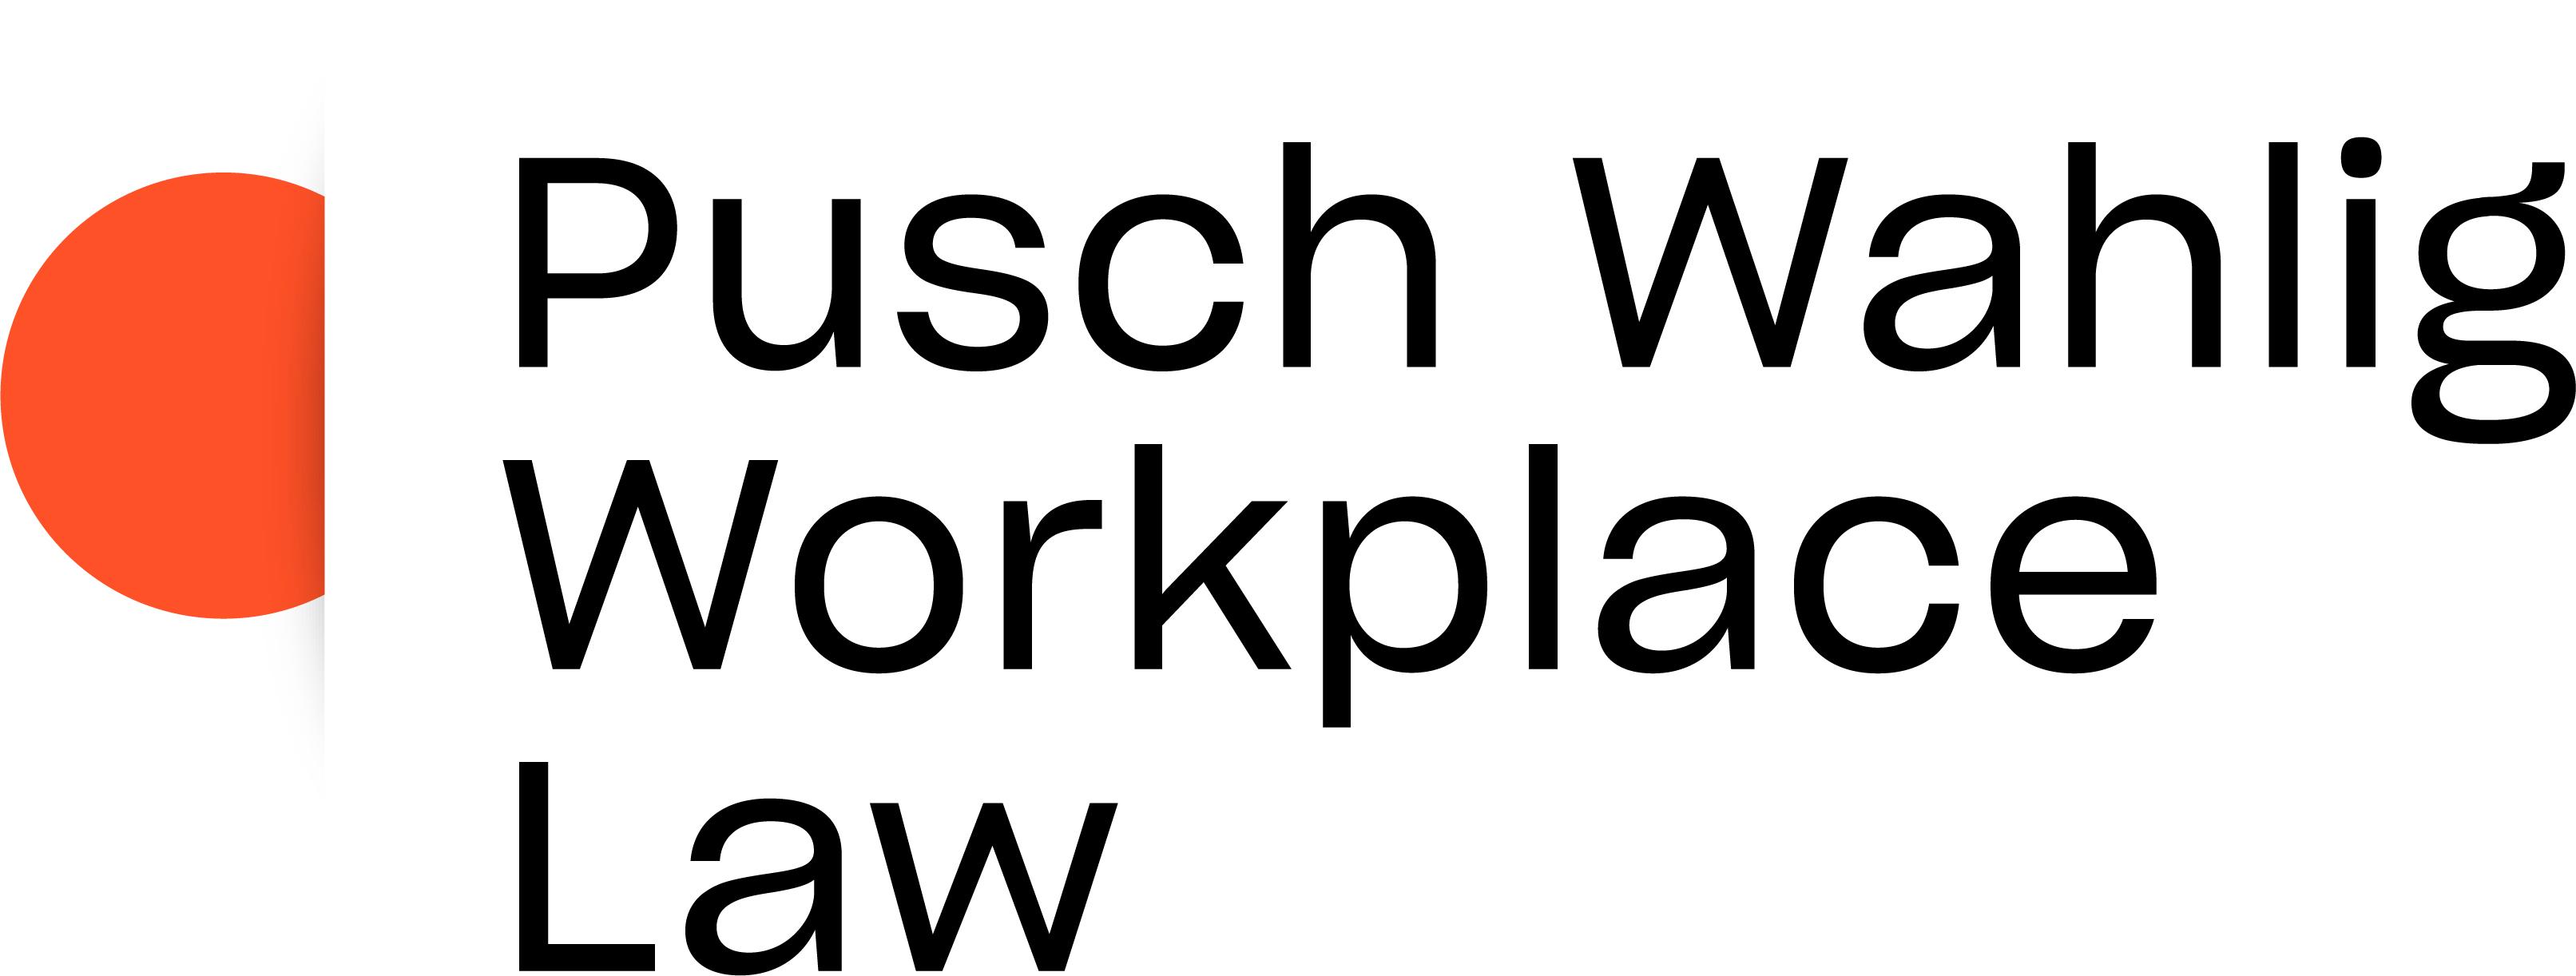 Pusch Wahlig Workplace Law